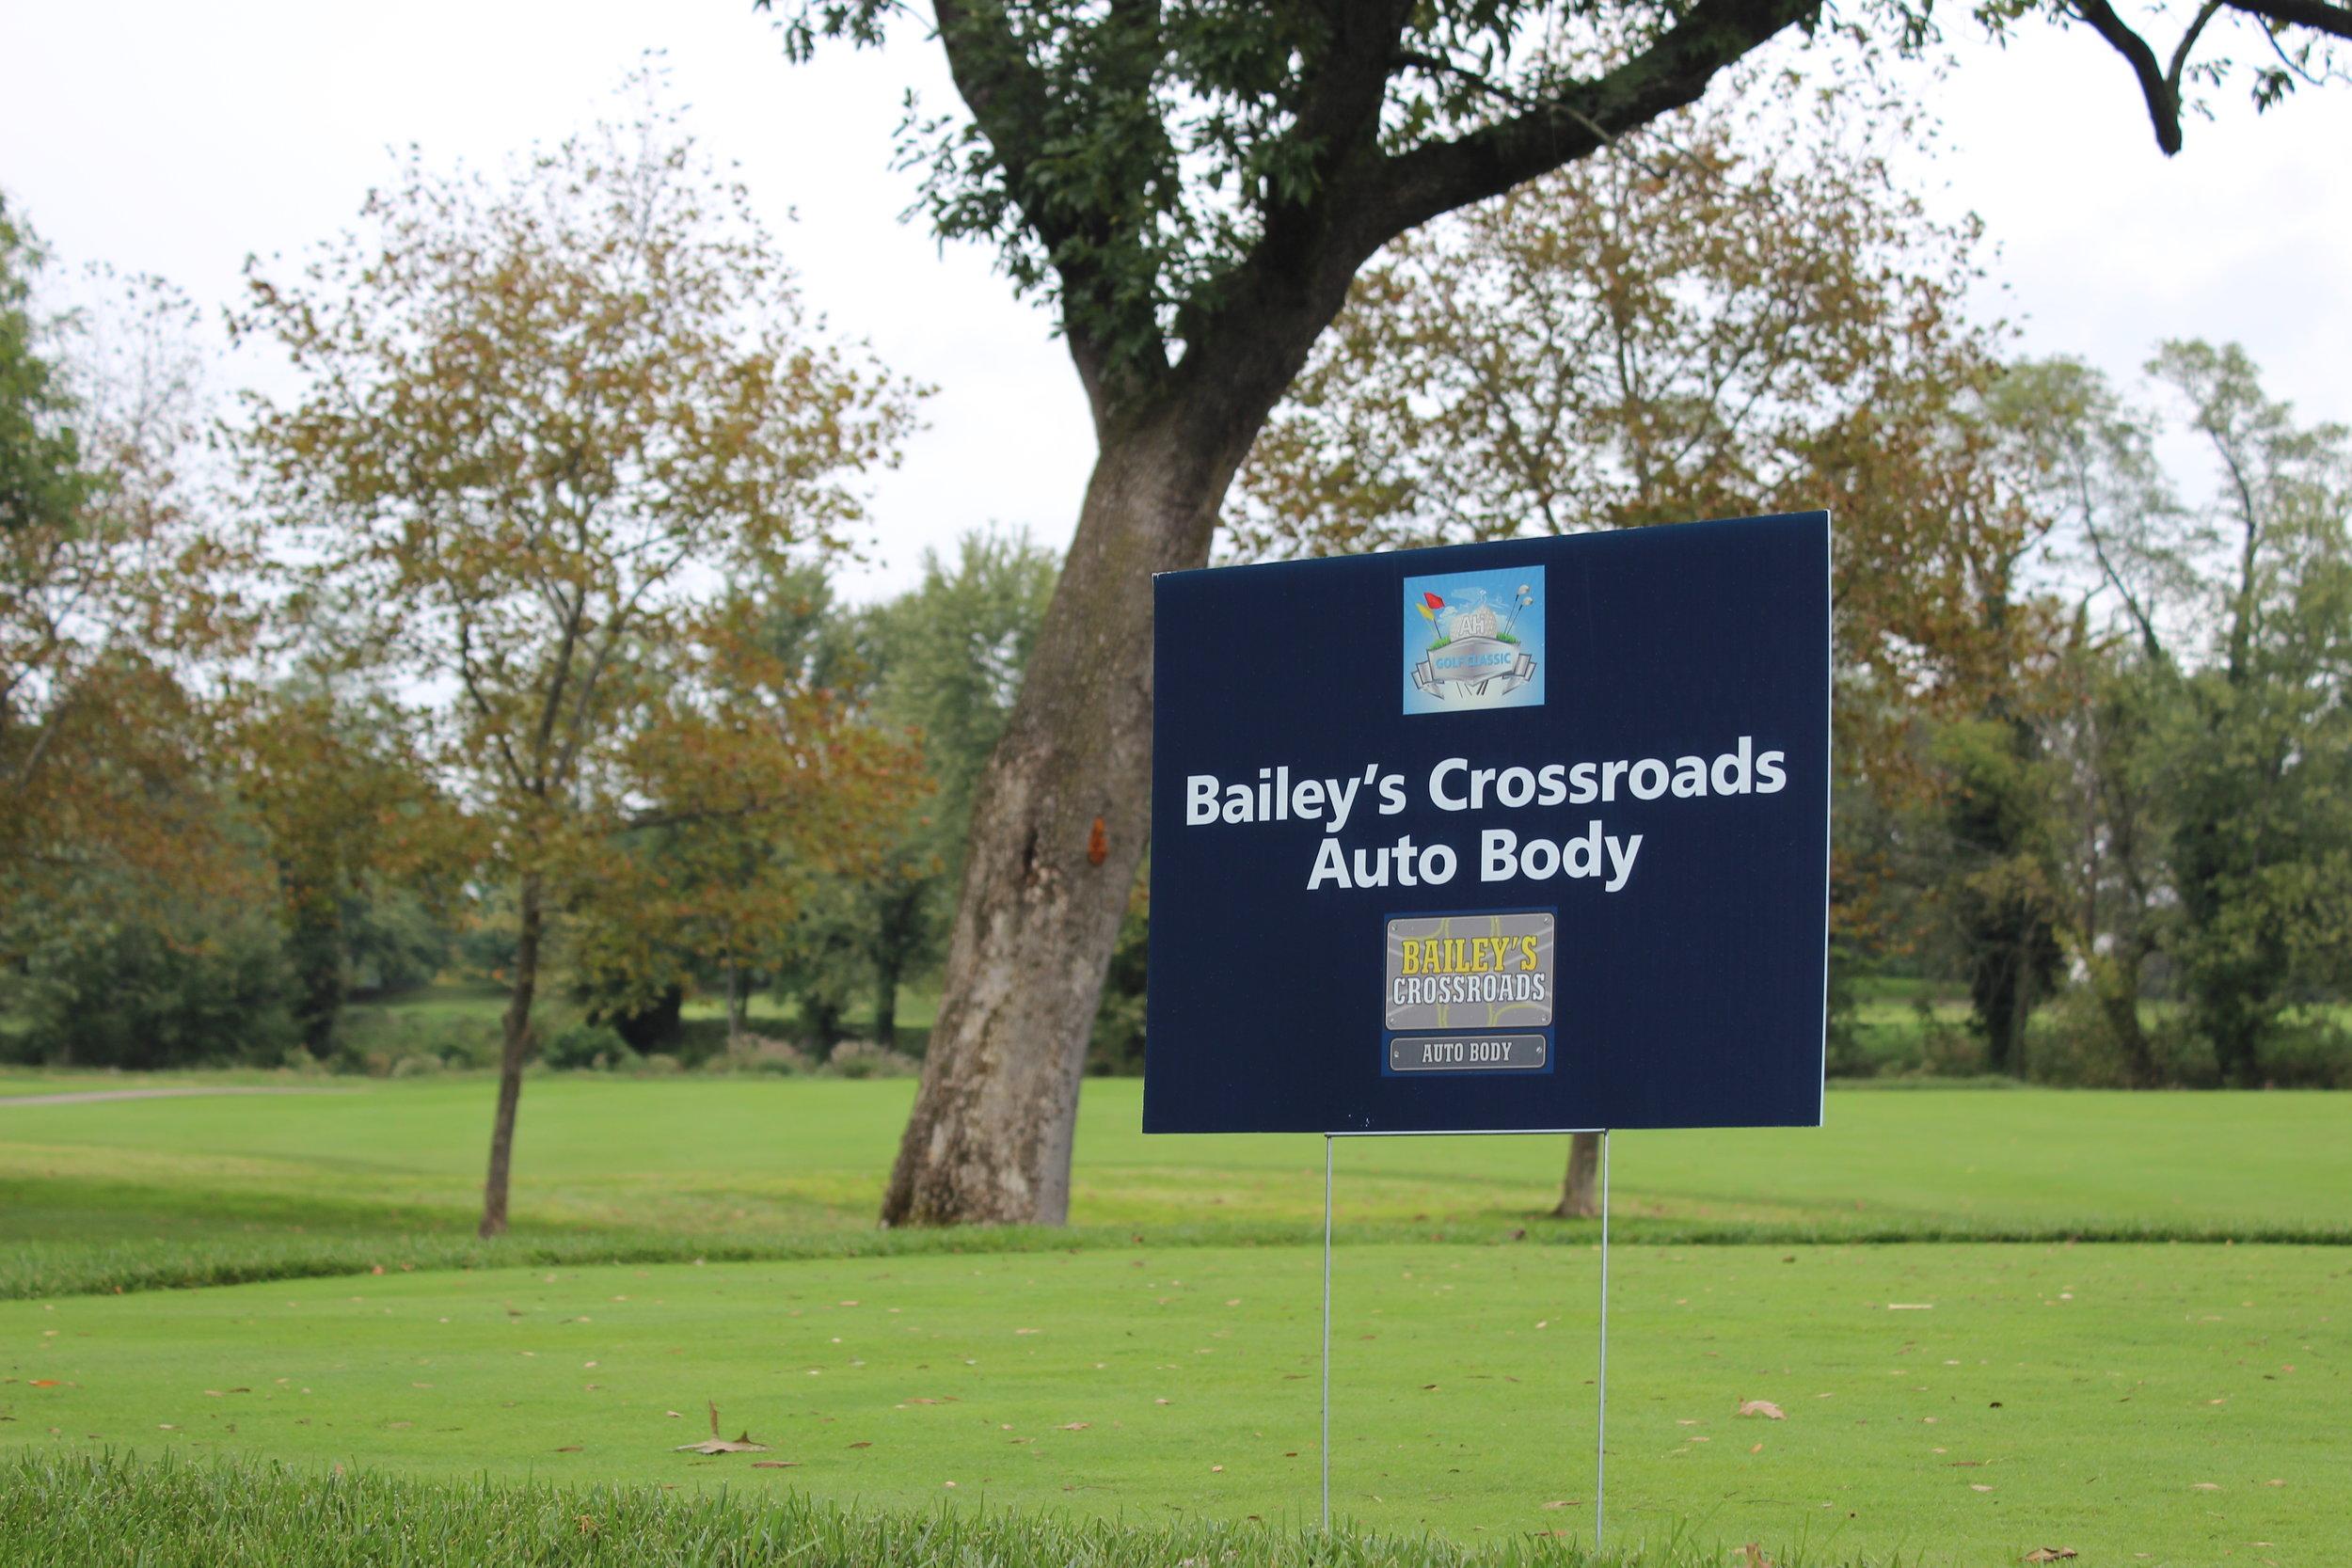 Bailey's Crossroads Auto Body, Hole Sponsor.